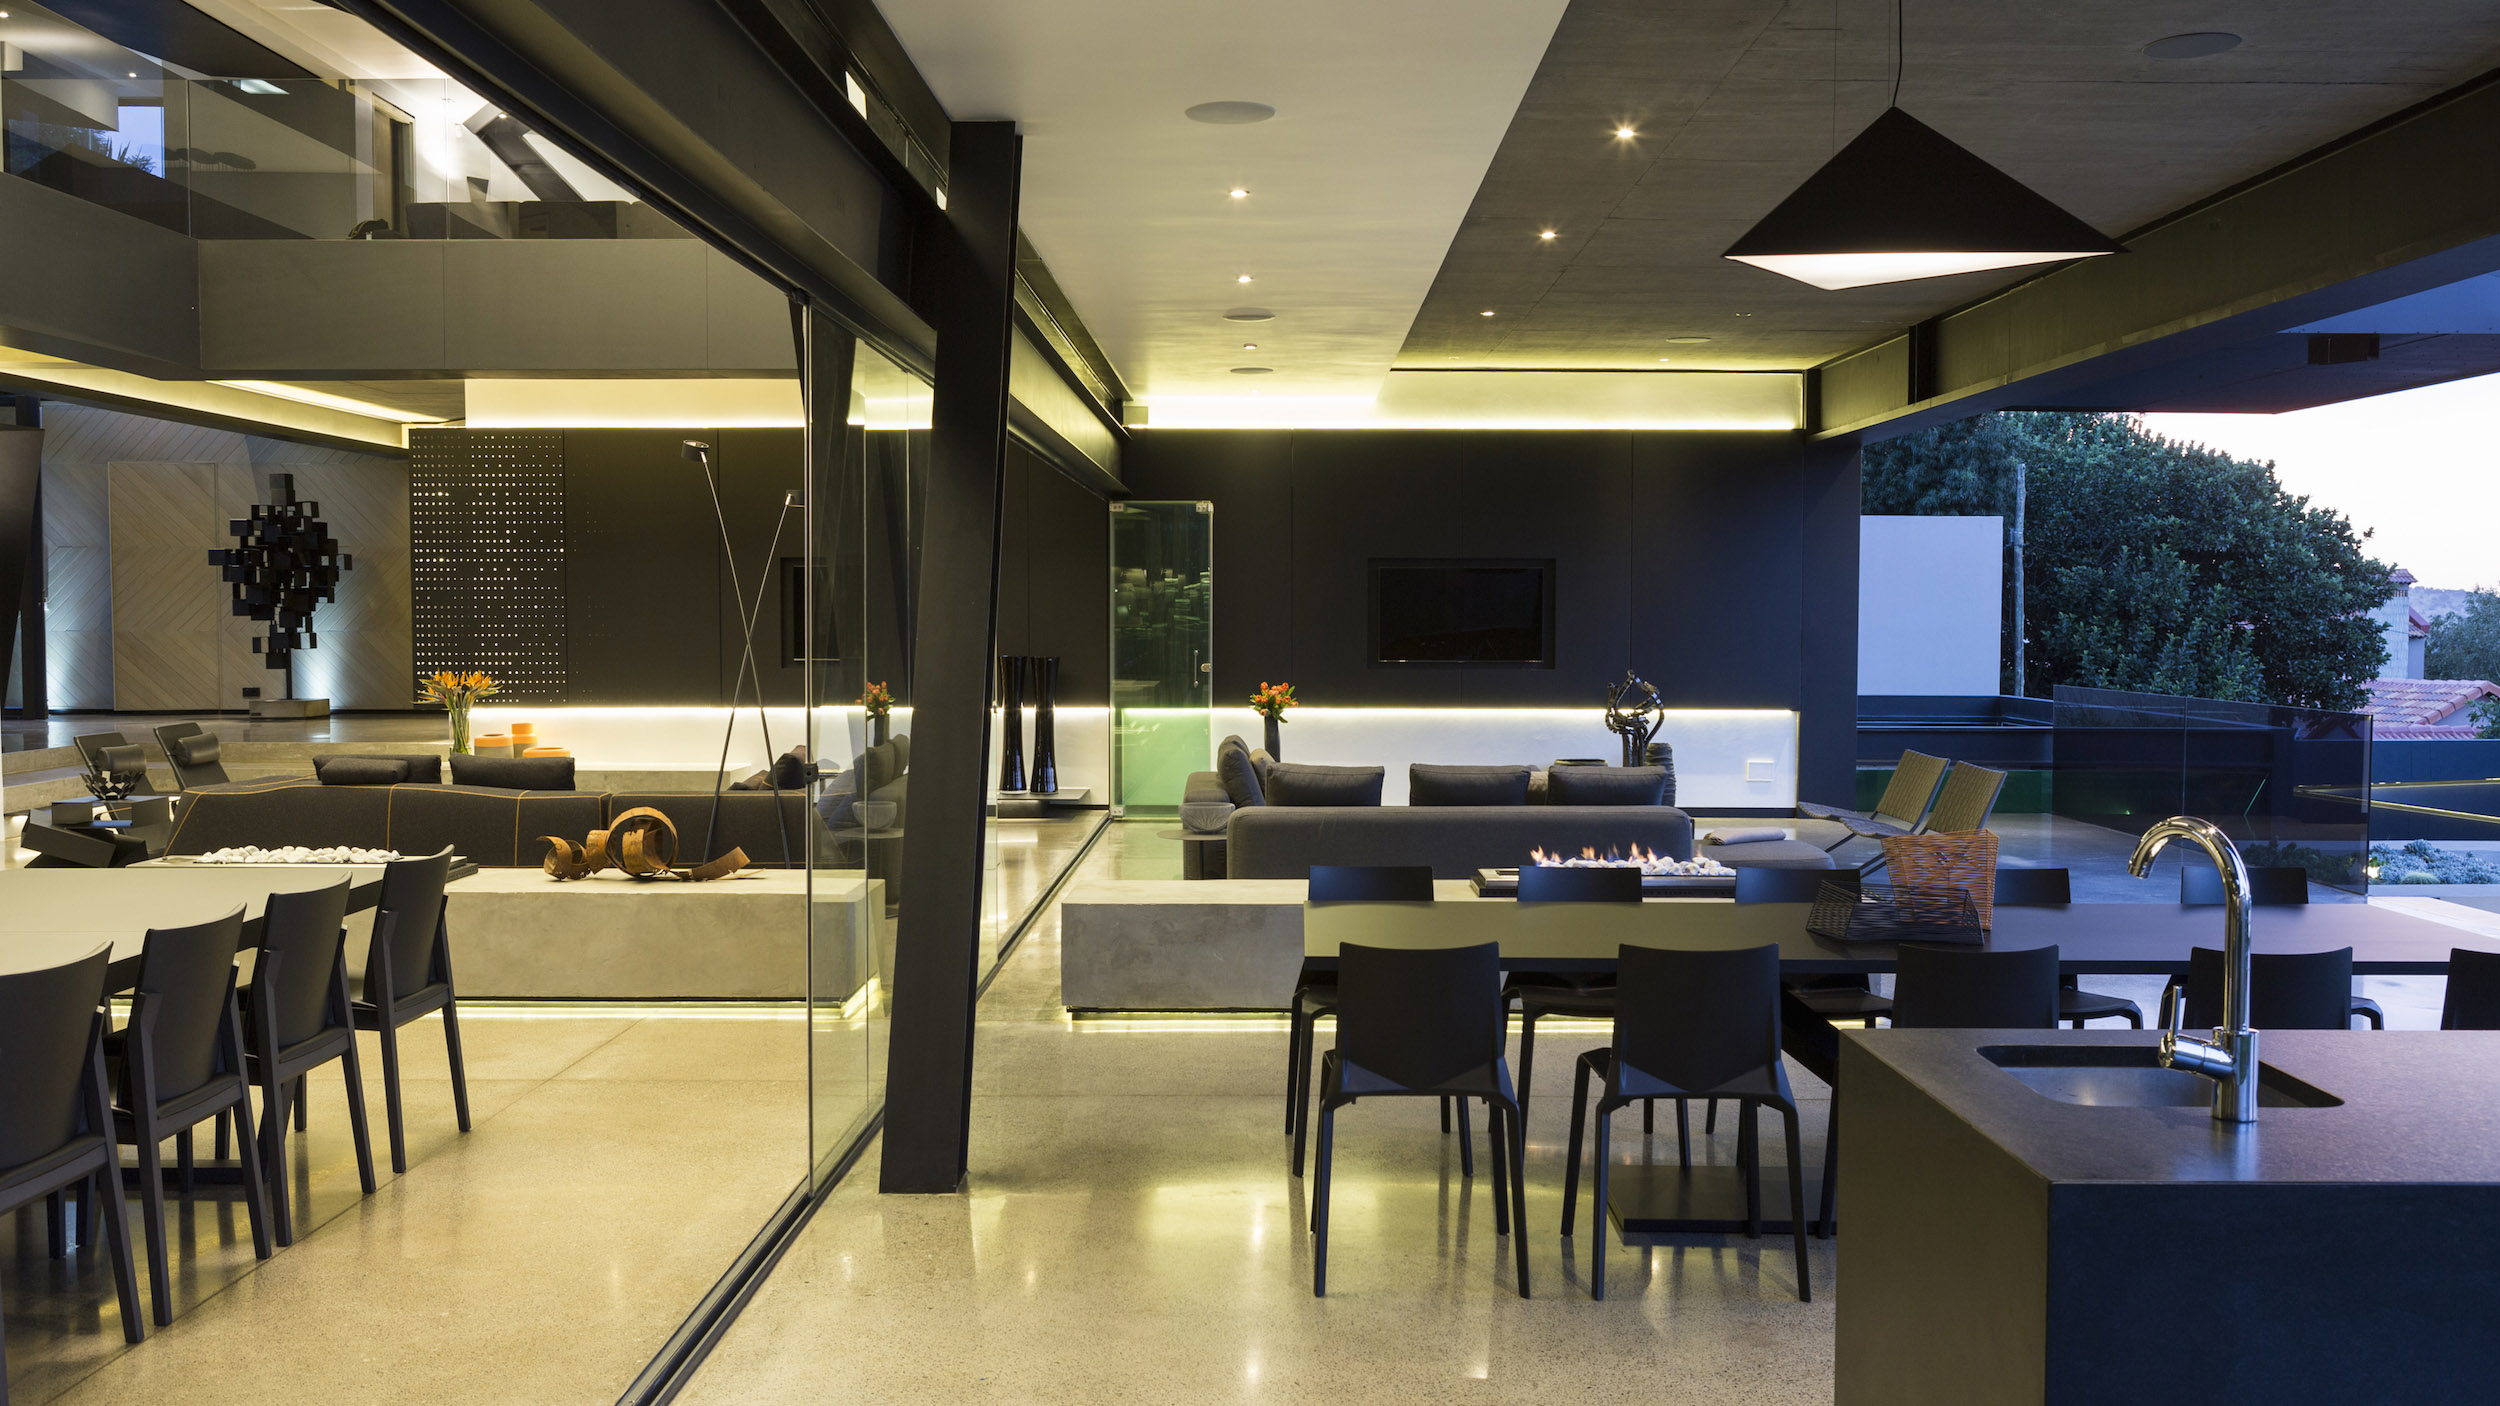 Kloof Road Masterpiece House in Johannesburg by Nico van der Meulen Architects-24